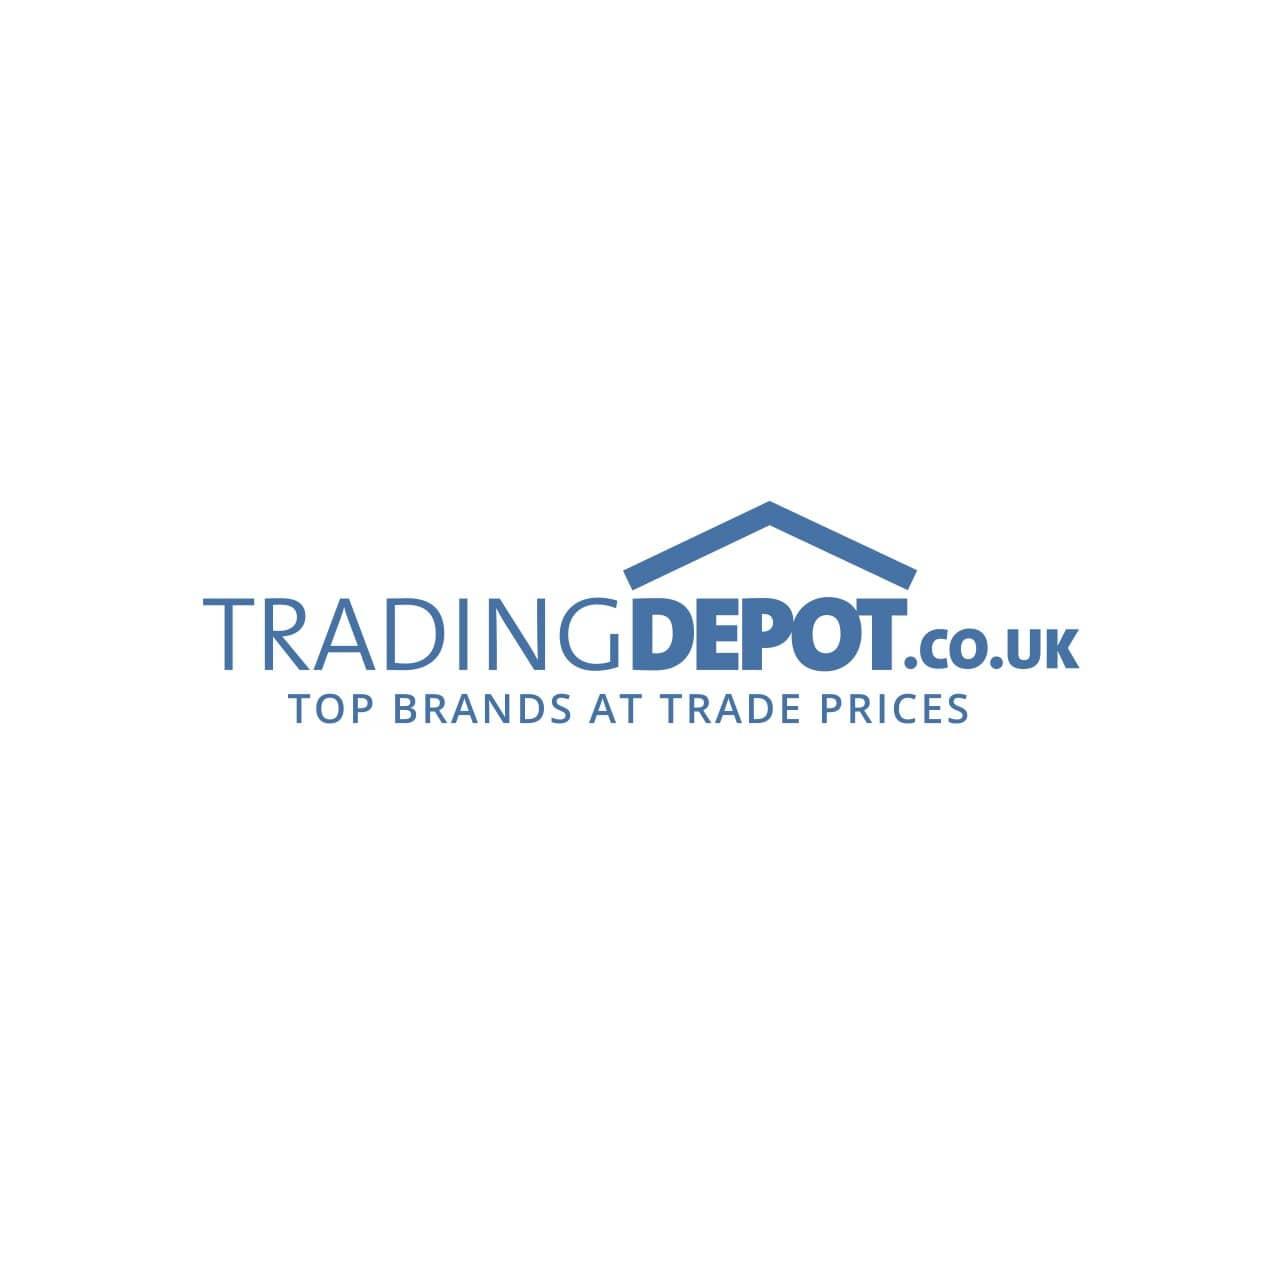 Velux Centre Pivot Roof Window with Obsure Laminated Inner & Toughened Outer Pane Glazing – White Polyurethane 134 x 140cm - GGU UK08 0034